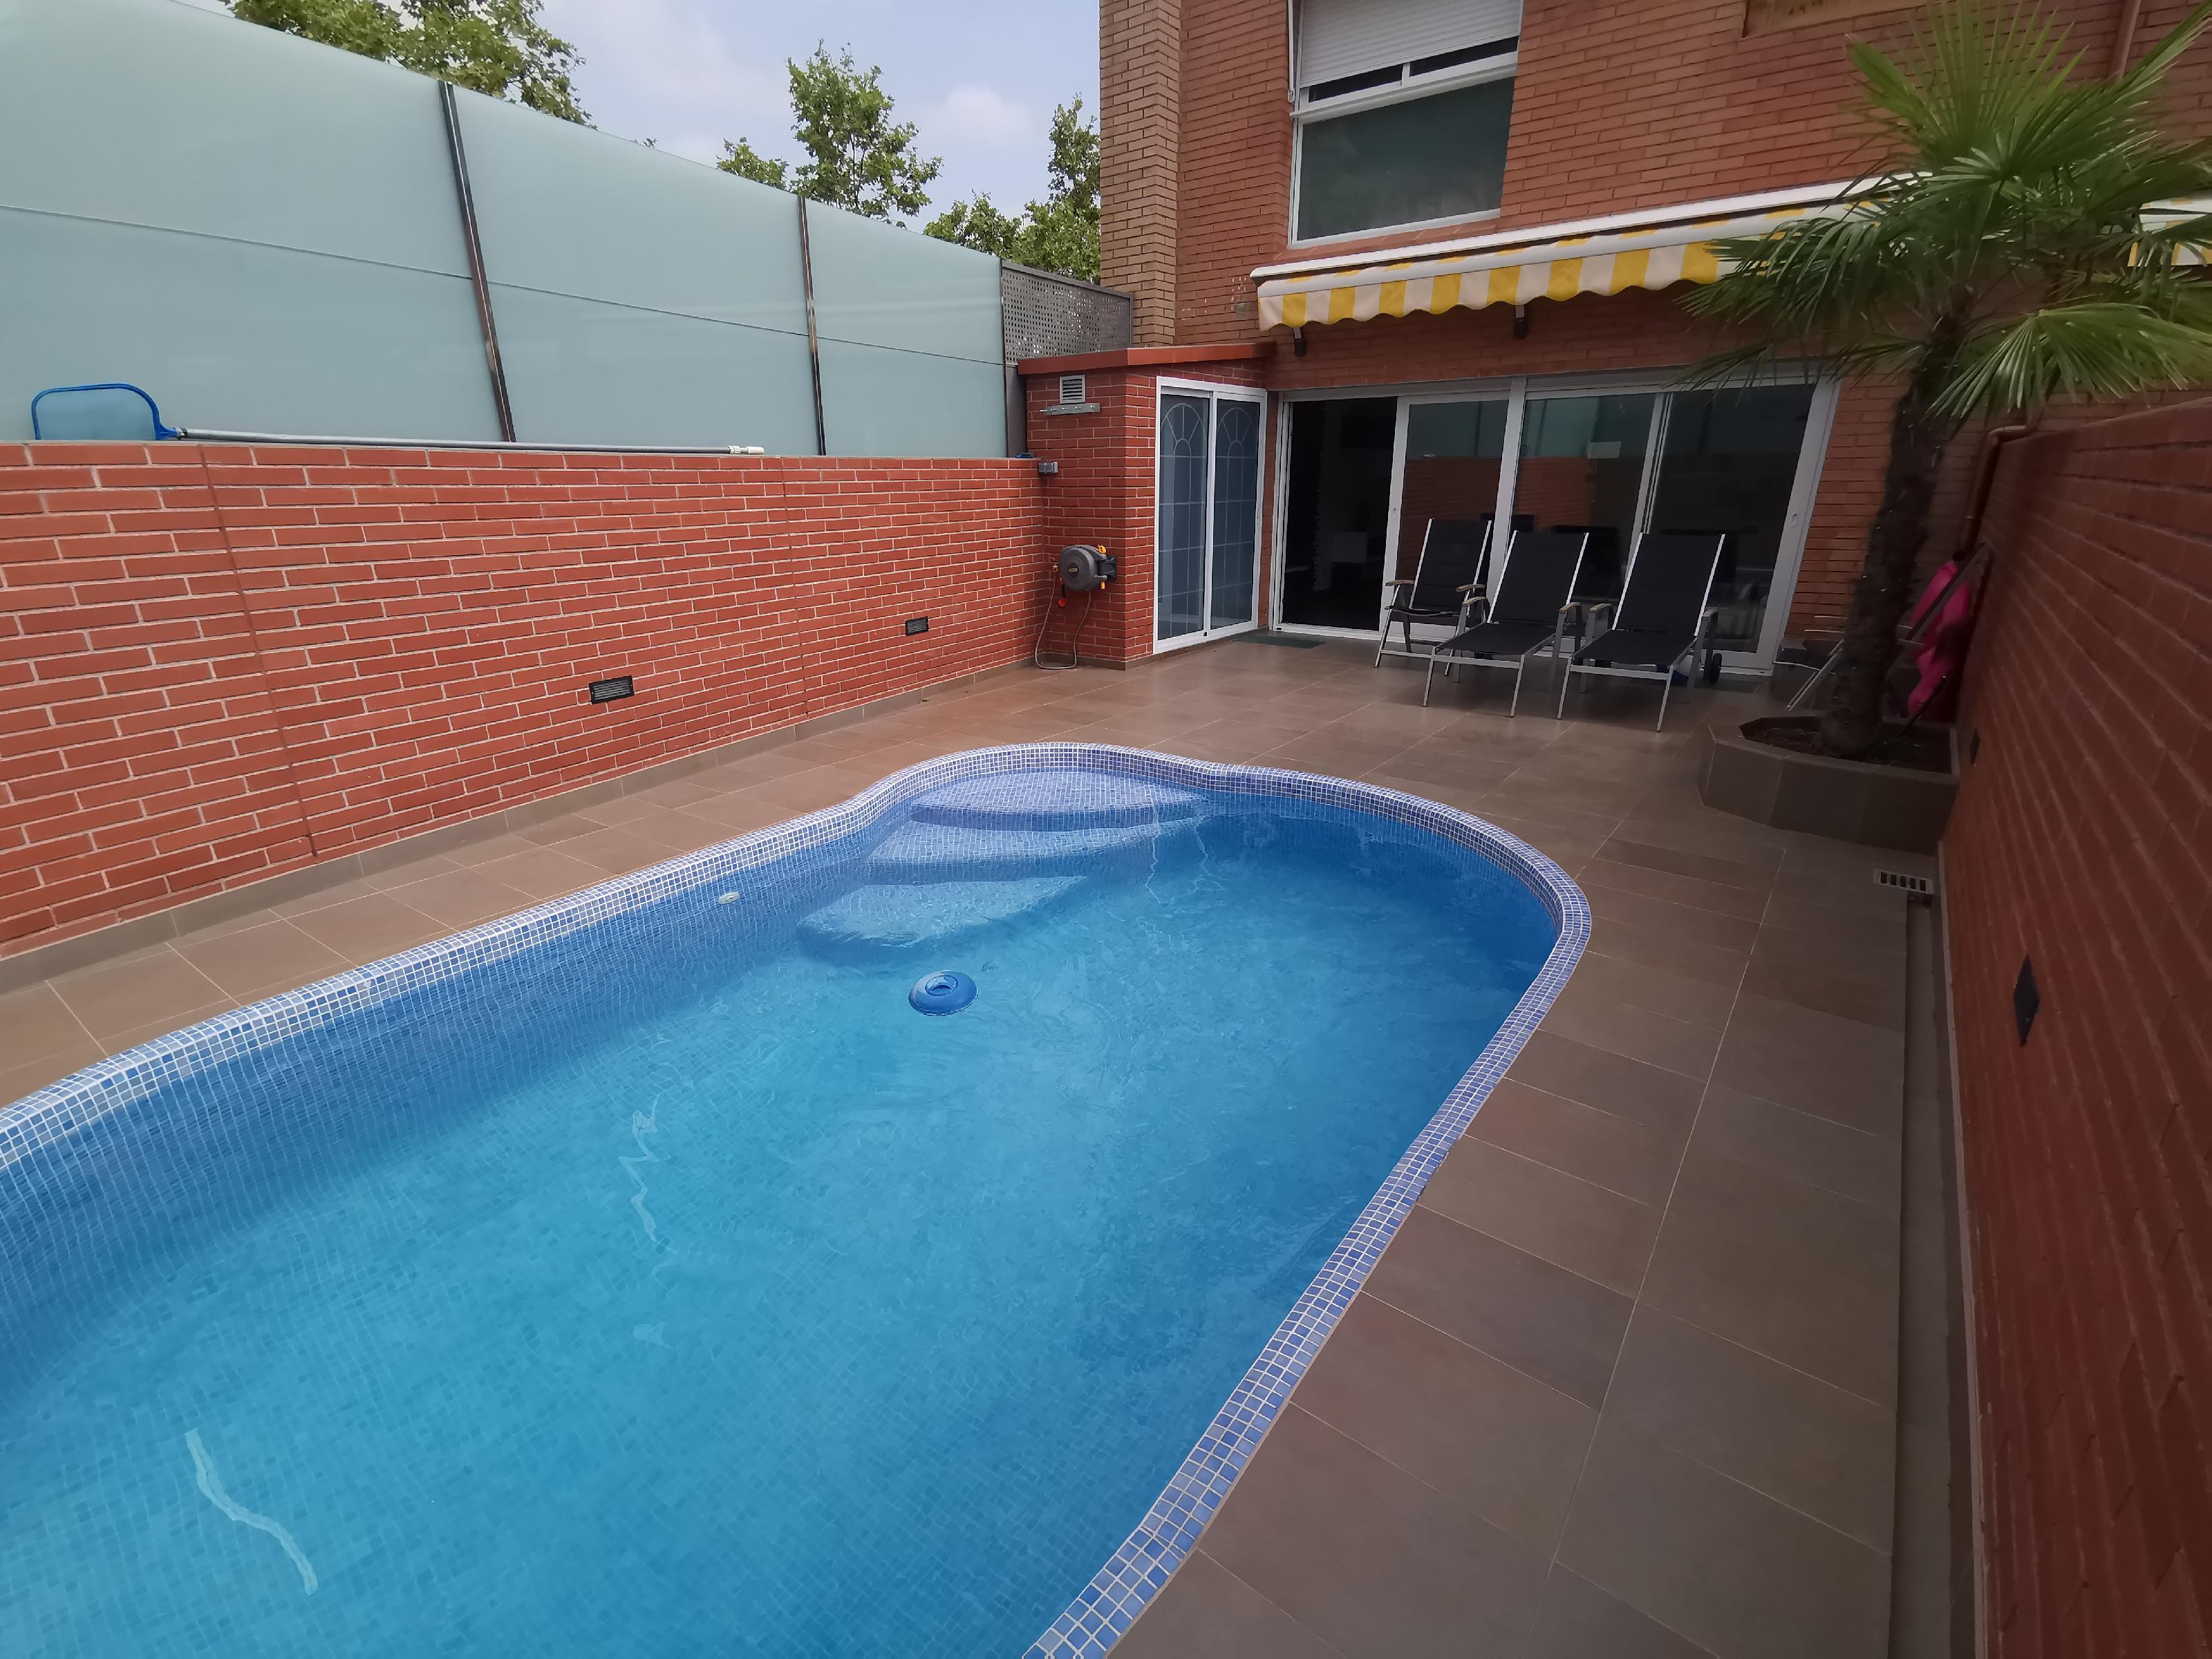 Imagen 1 Casa Adosada en venta en Badalona / Bonavista badalona